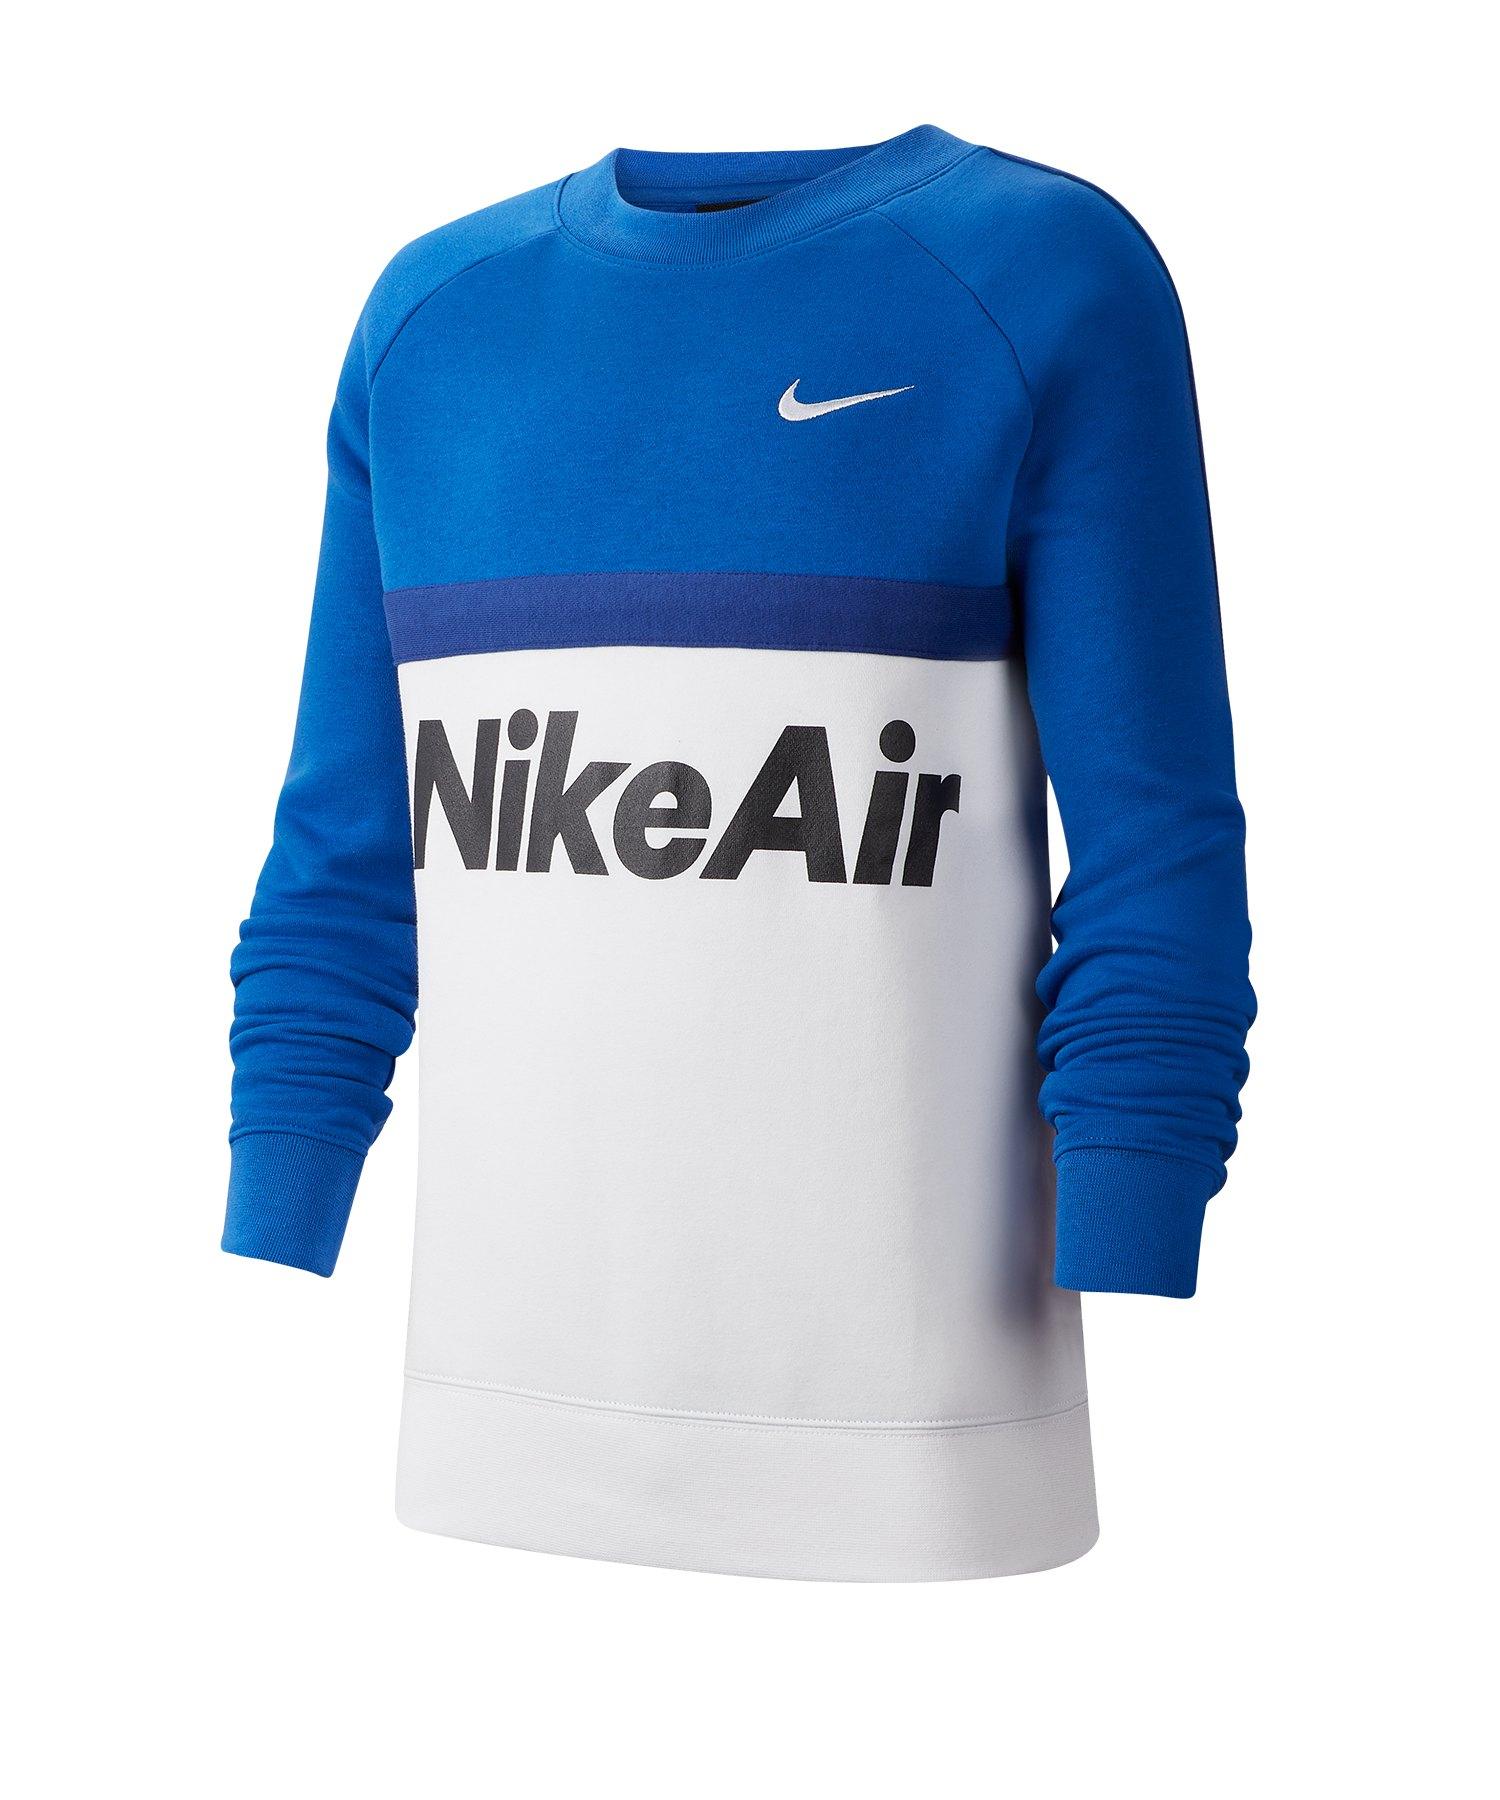 Nike Air Crew Sweatshirt Kids Blau F480 - blau